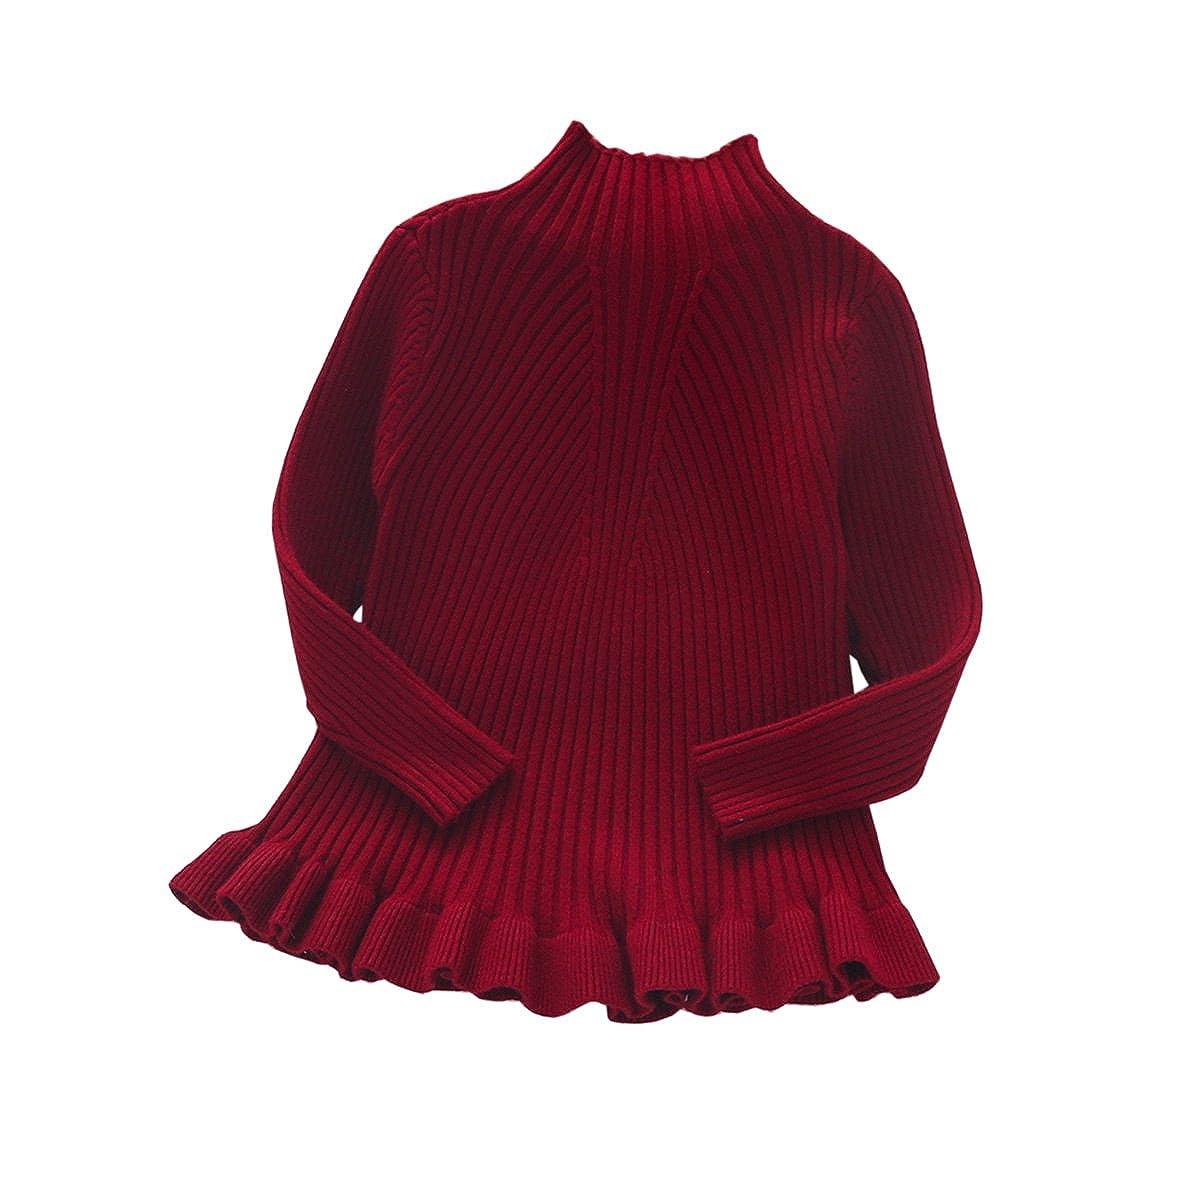 Baby Little Girls Ruffle Knit Sweater Kids High Neck Winter Sweatshirt Baseshirt Pullover